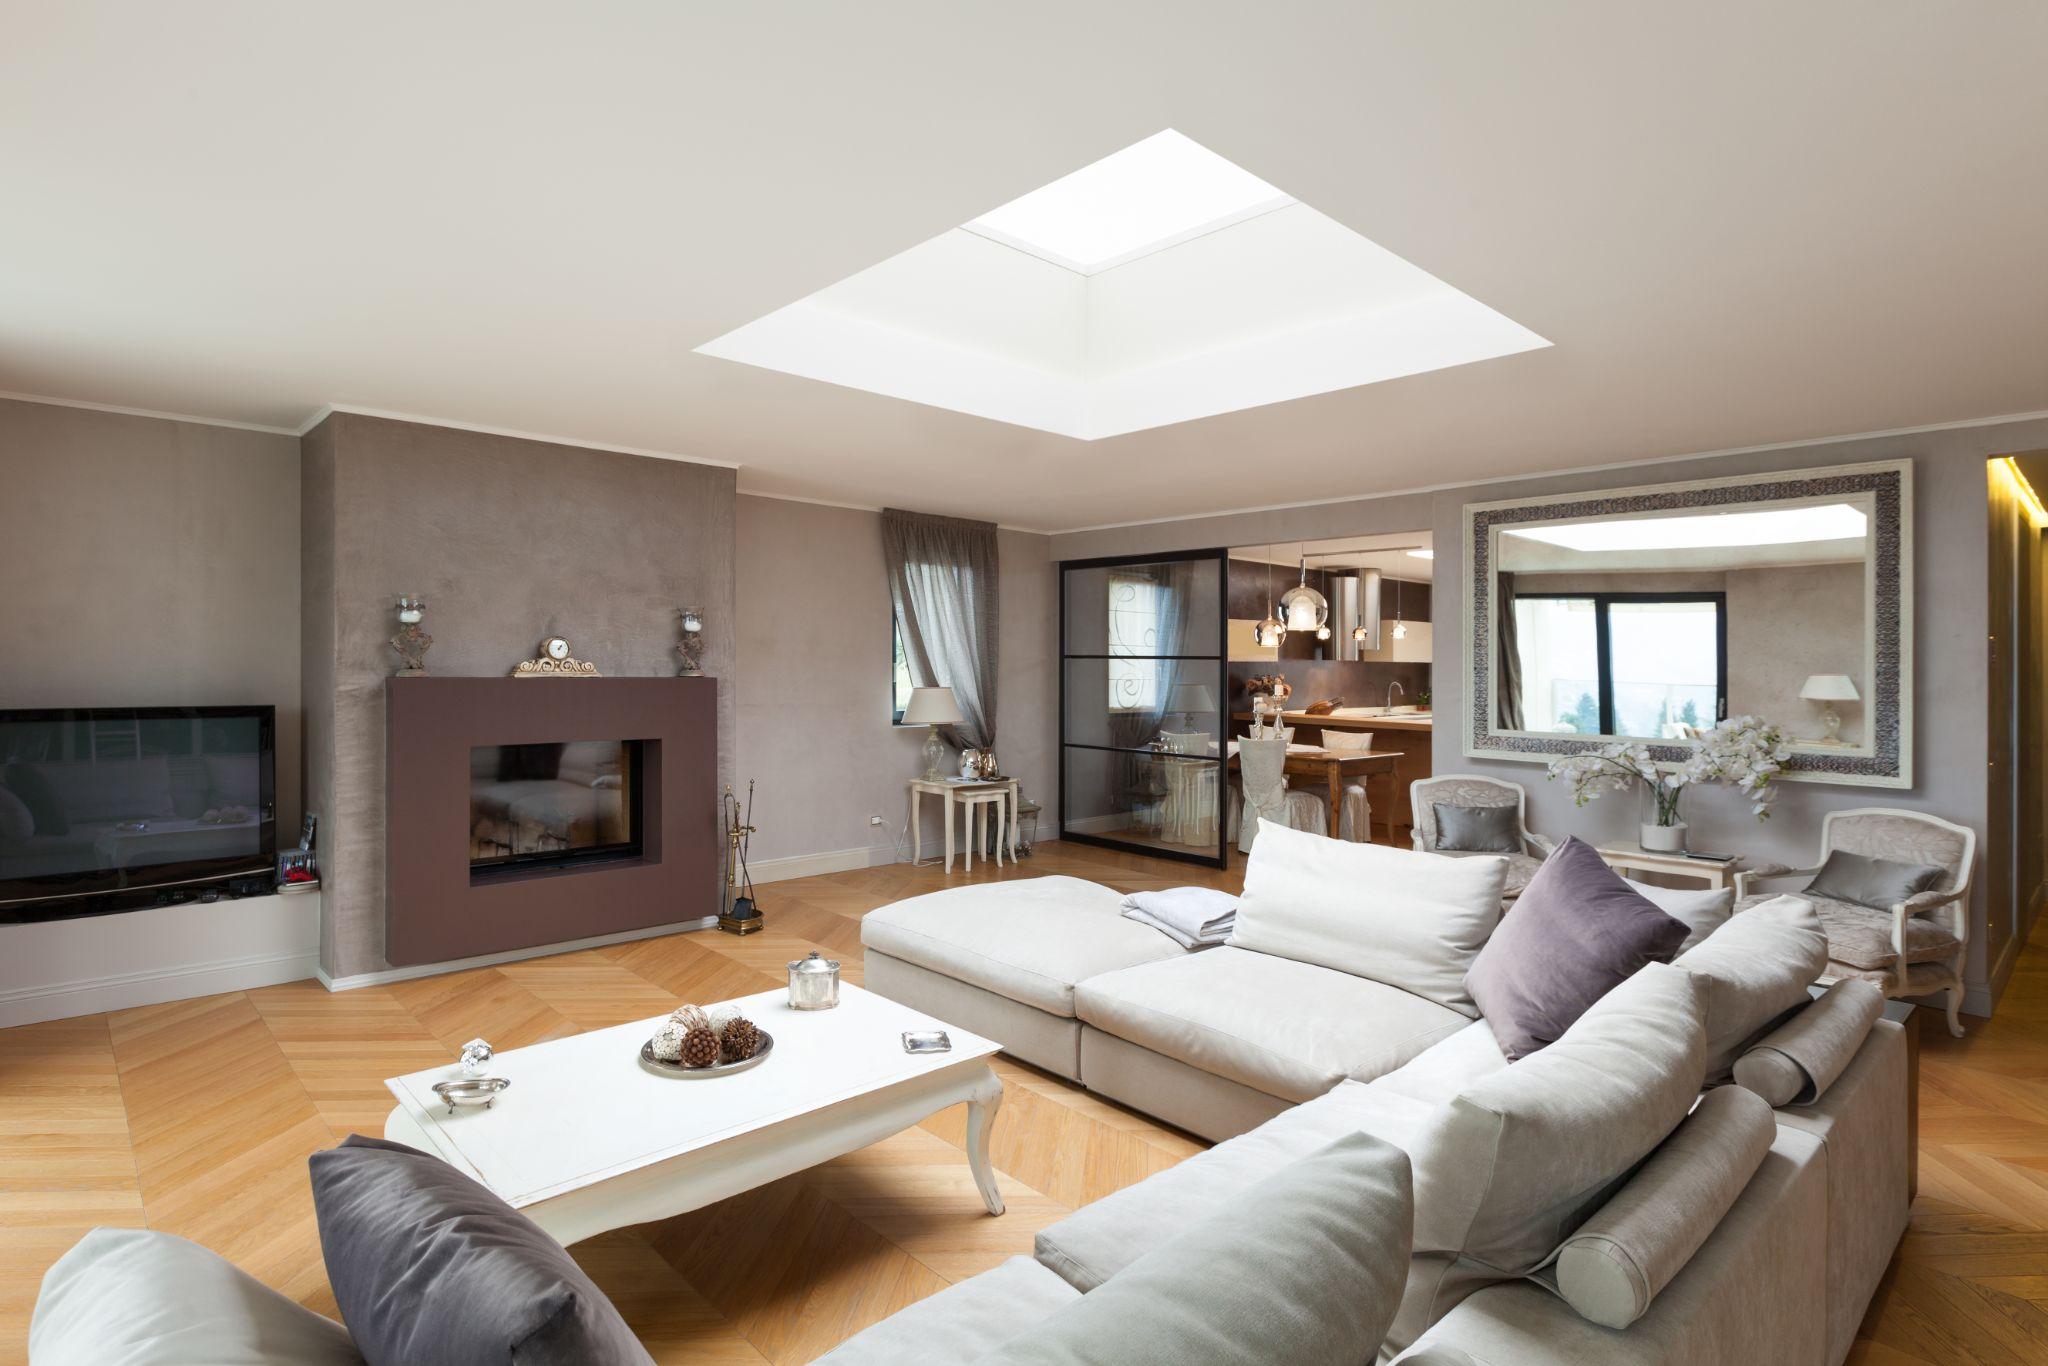 Roof Lantern Cost Poole